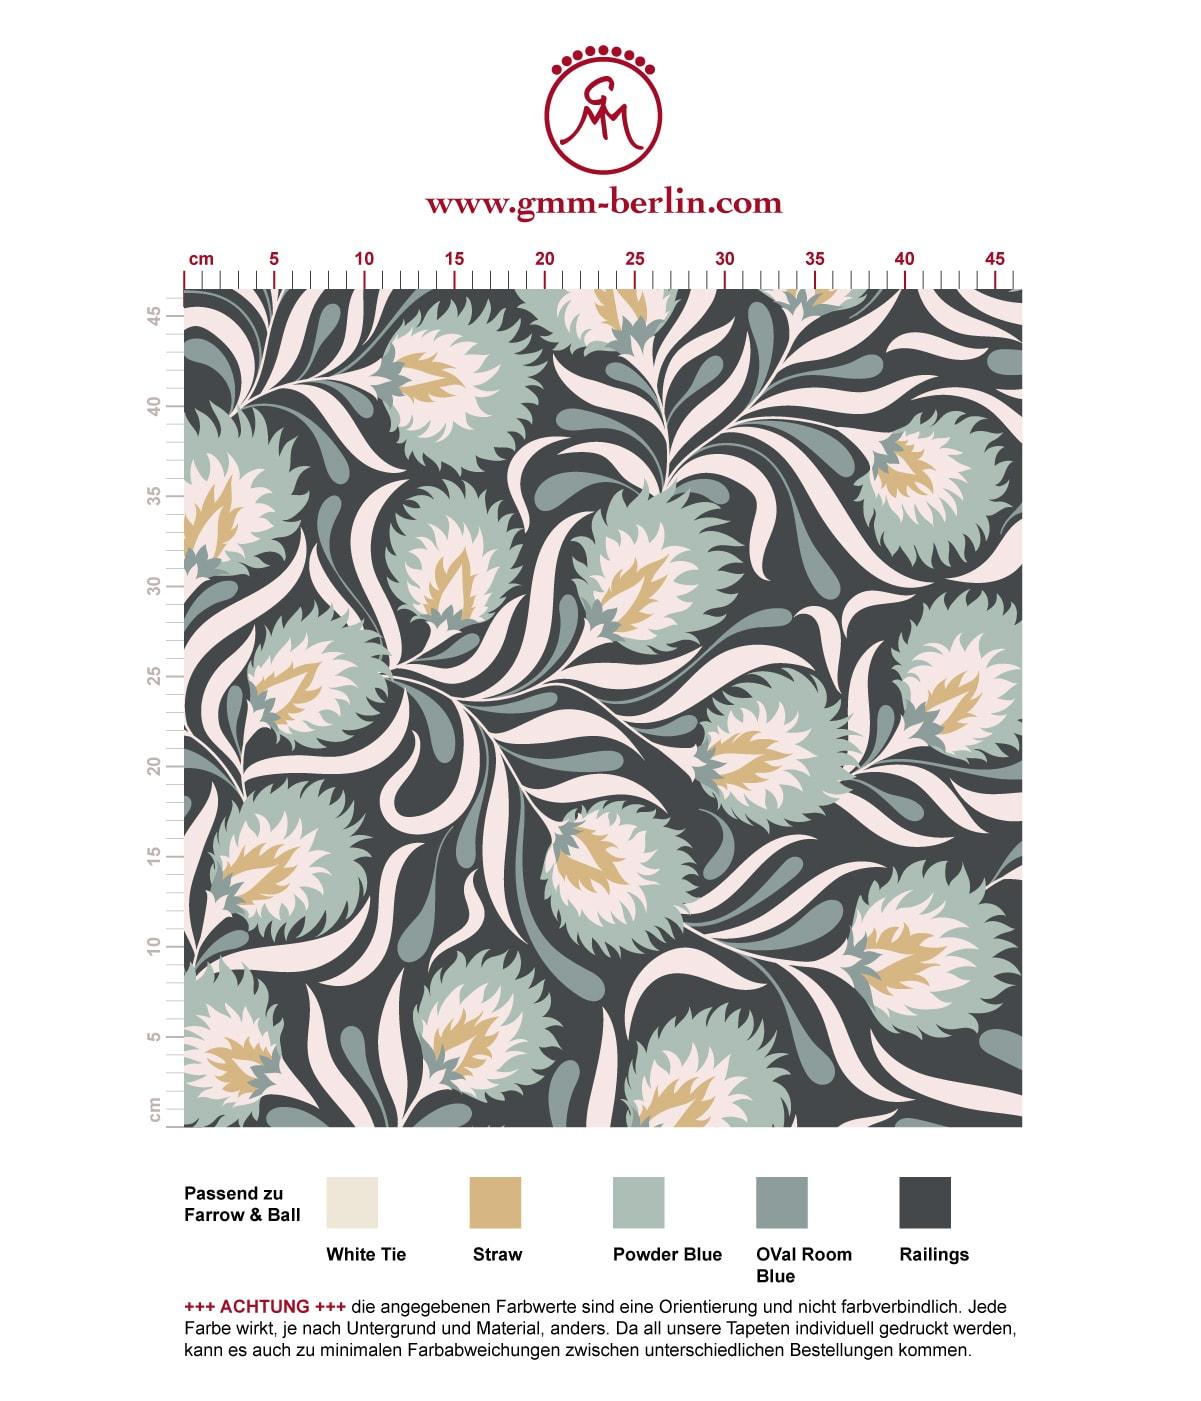 .Jugendstil Tapete mit großen Blüten in blau grau angepasst an Farrow & Ball Wandfarben. Aus dem GMM-BERLIN.com Sortiment: Schöne Tapeten in der Farbe: hellblau